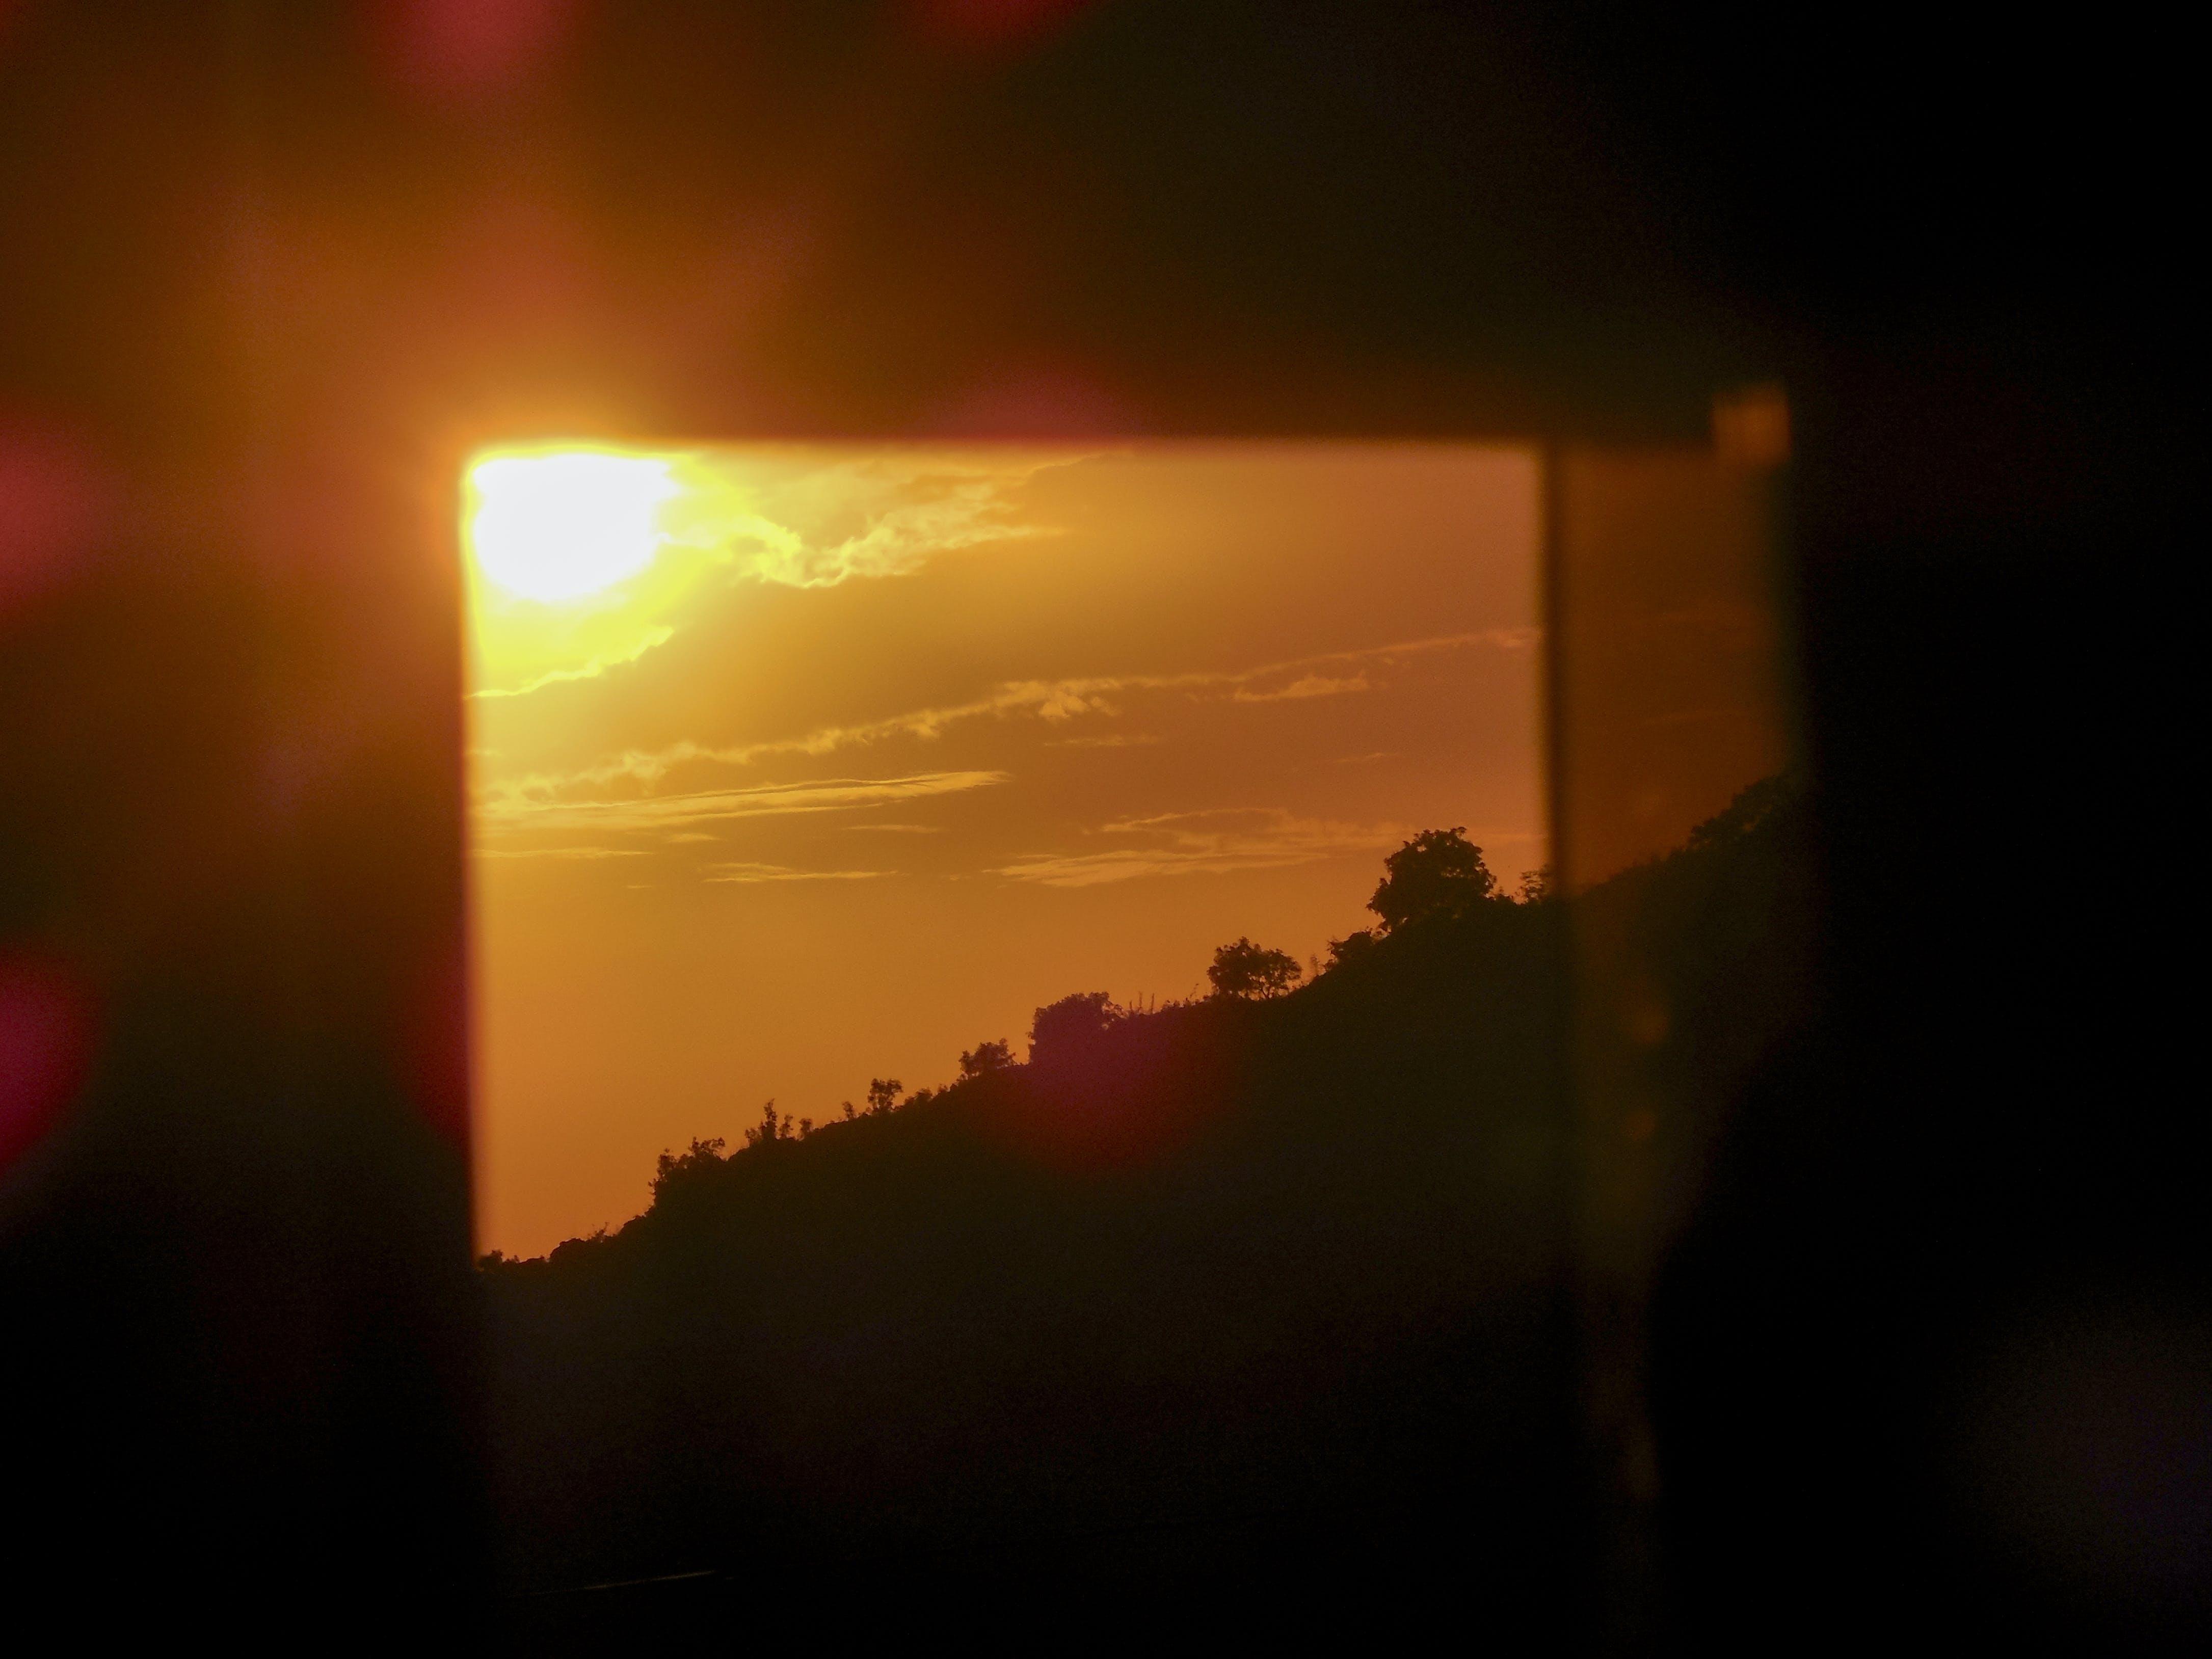 Free stock photo of downhill, evening sun, glass, golden hour